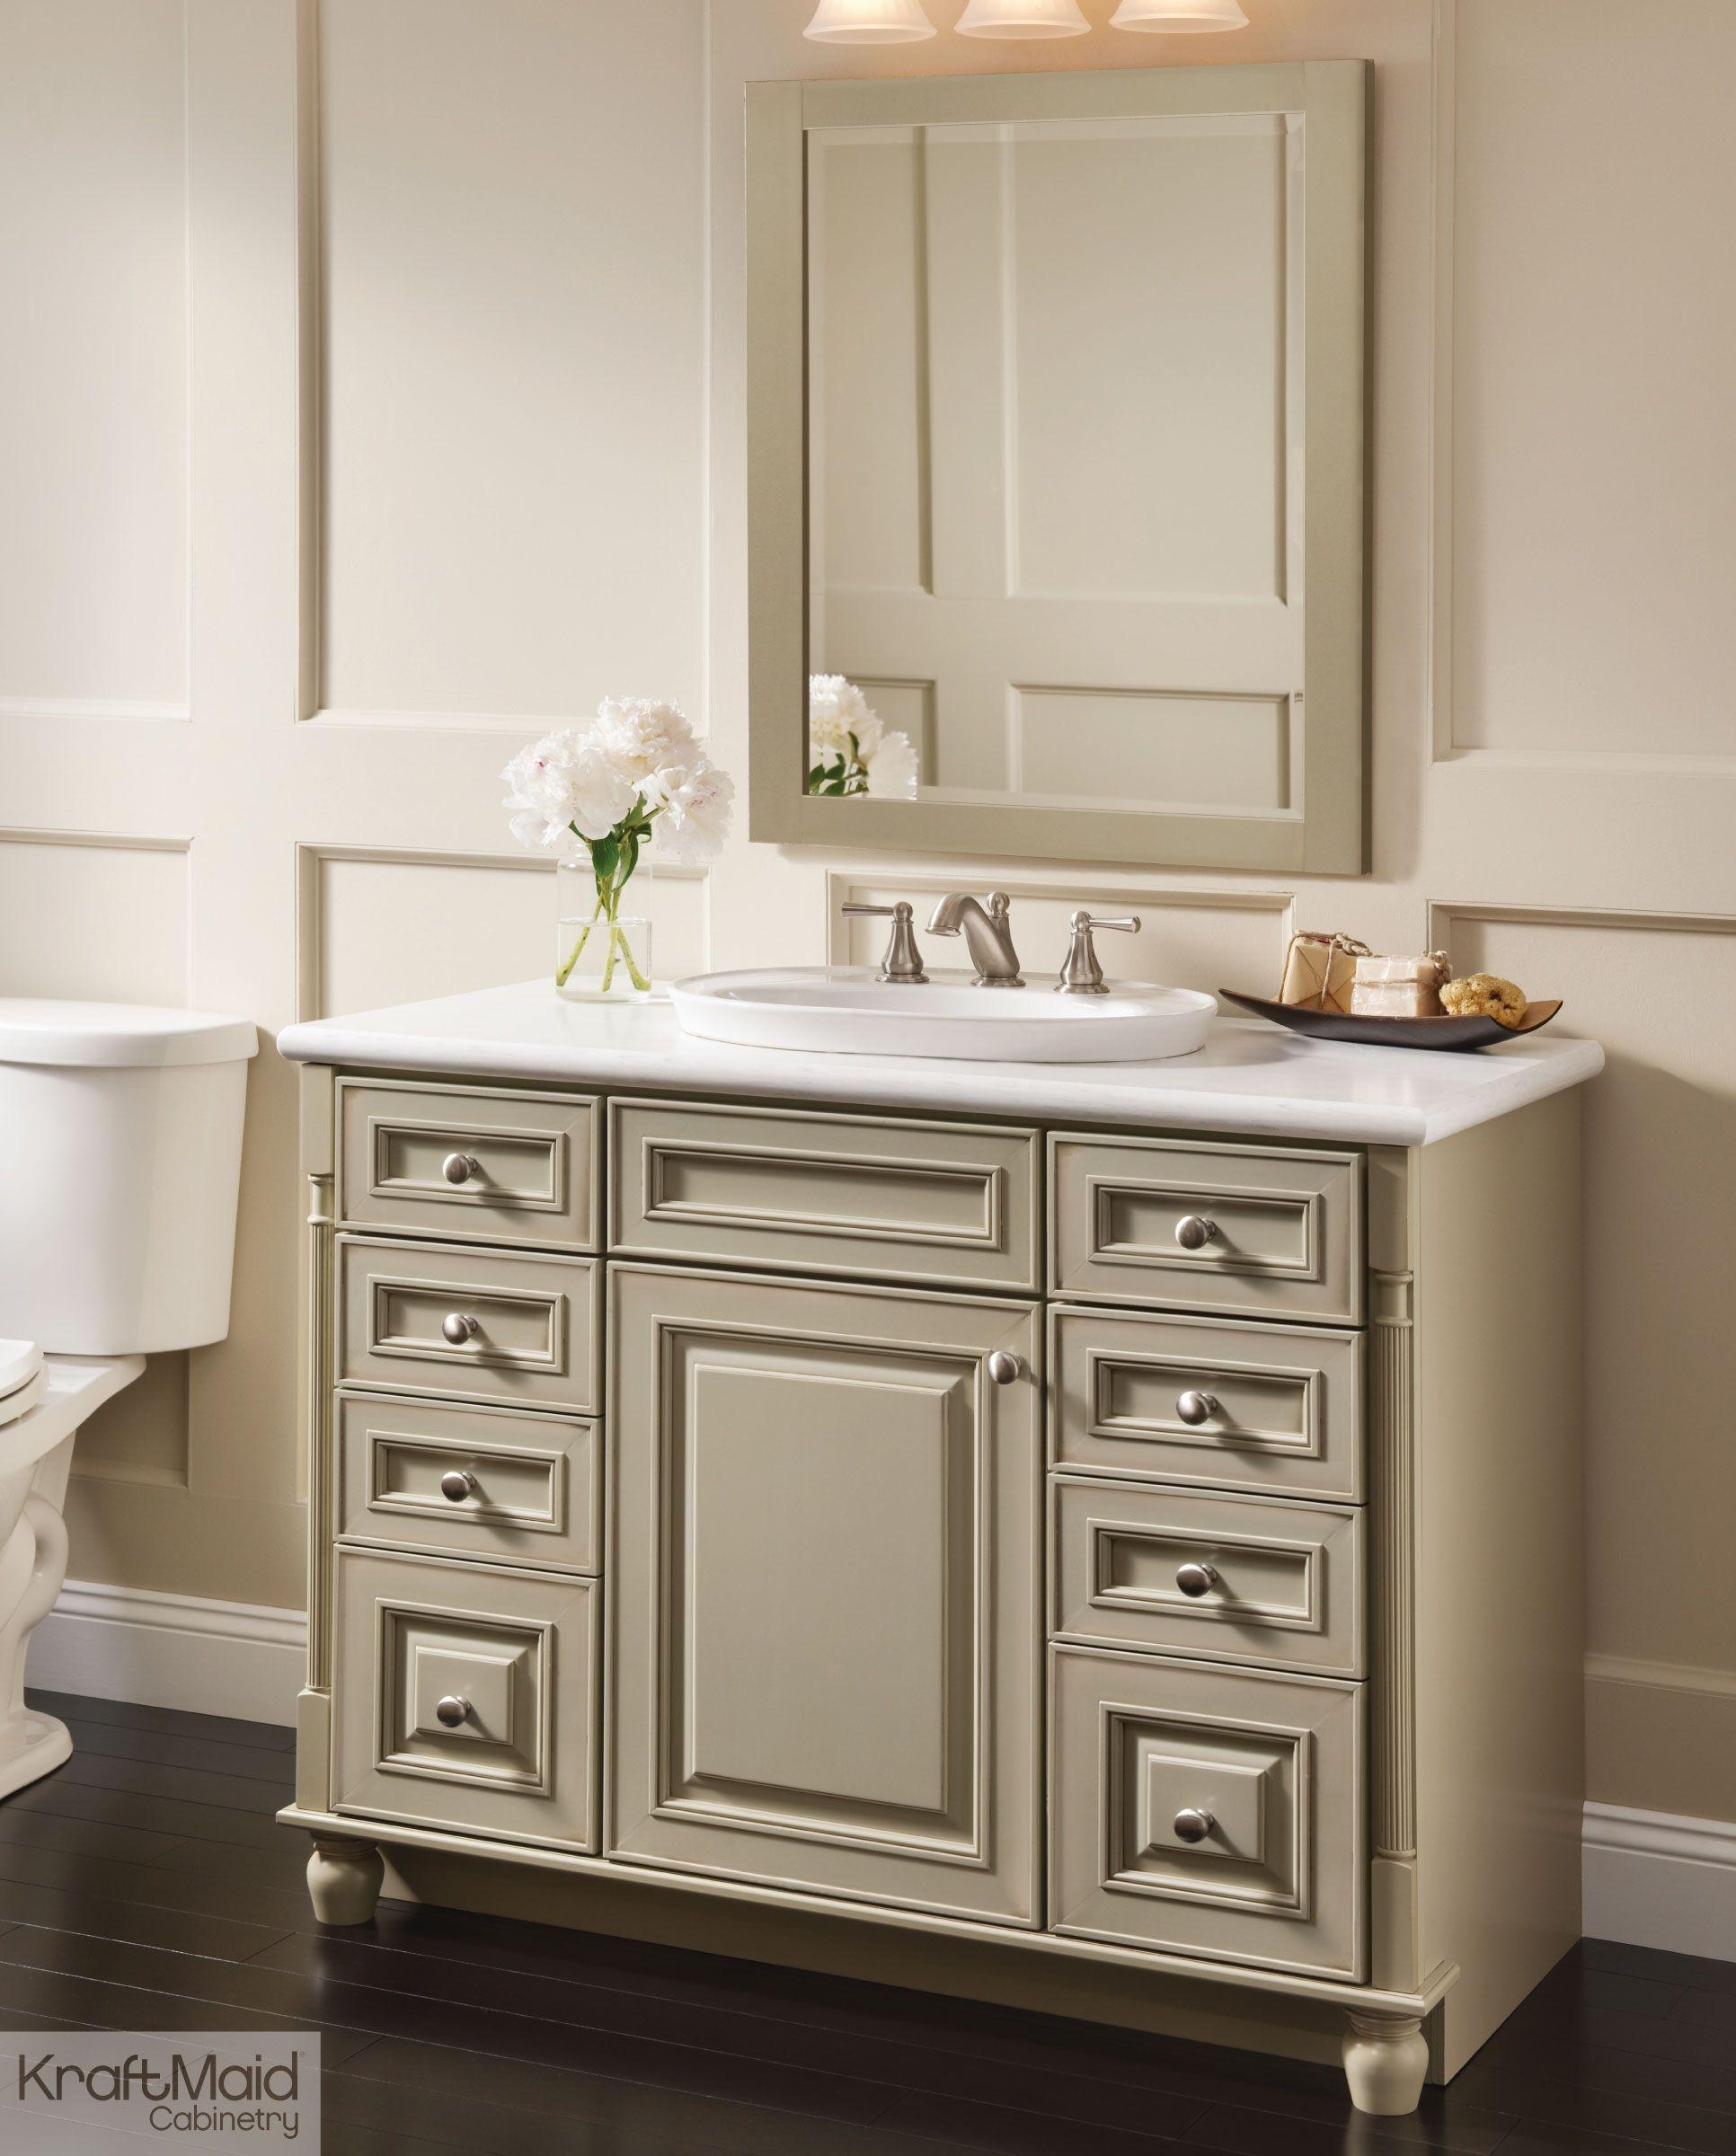 Superieur Bathroom Kraftmaid Cabinet Sizes Kraftmaid Bathroom Vanity Inside Dimensions  1932 X 2400